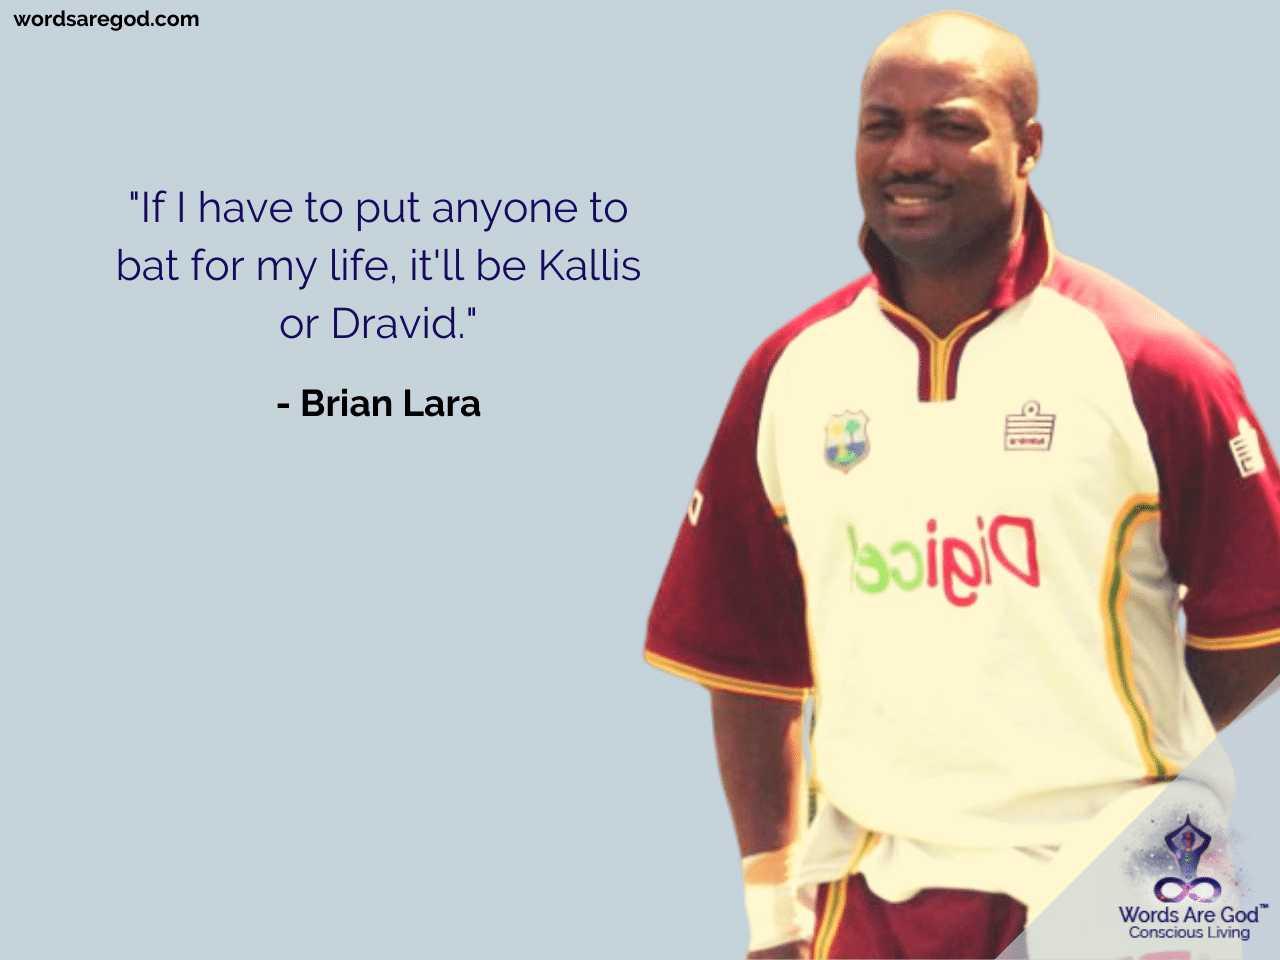 Brian Lara Inspirational Quote by Brian Lara